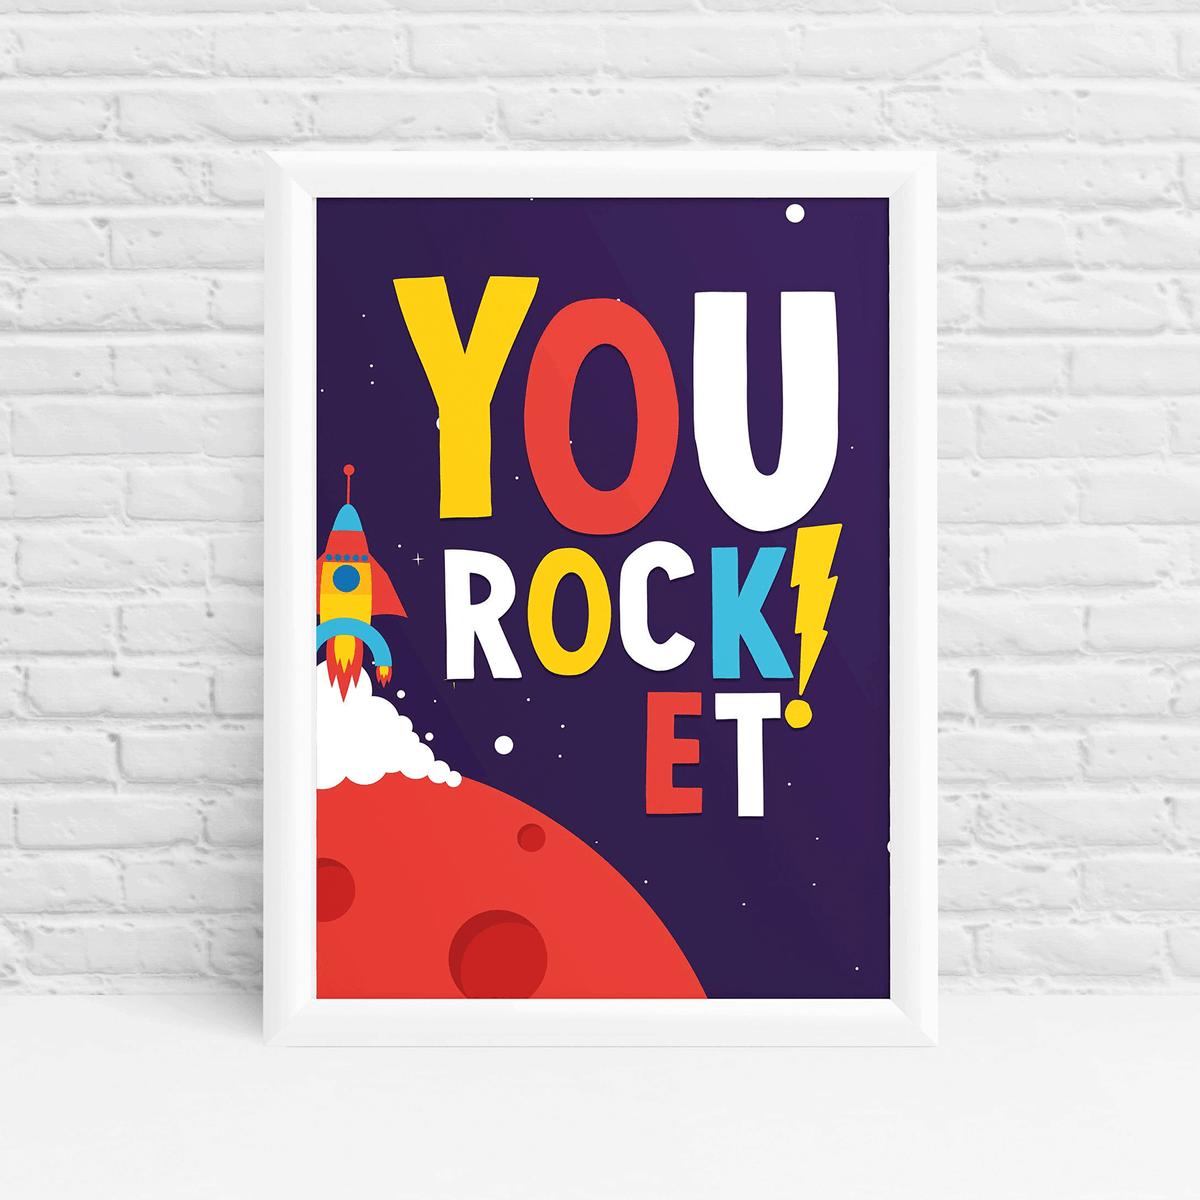 #Space is #Ace #WallArt by #Ibbleobble!   https://t.co/vxSLBvNGDB  #Spaceship #Prints #Nursery #Decor #Decoration #Art #Children #Astronauts #NASA #Rocket #SpaceMan #Kids #Bedroom #WallArt #OfficeSpace #Fun #Cool #ShopSmallUK #WednesdayThoughts #WednesdayWisdom #Wednesday https://t.co/n8gdqf1Xbt